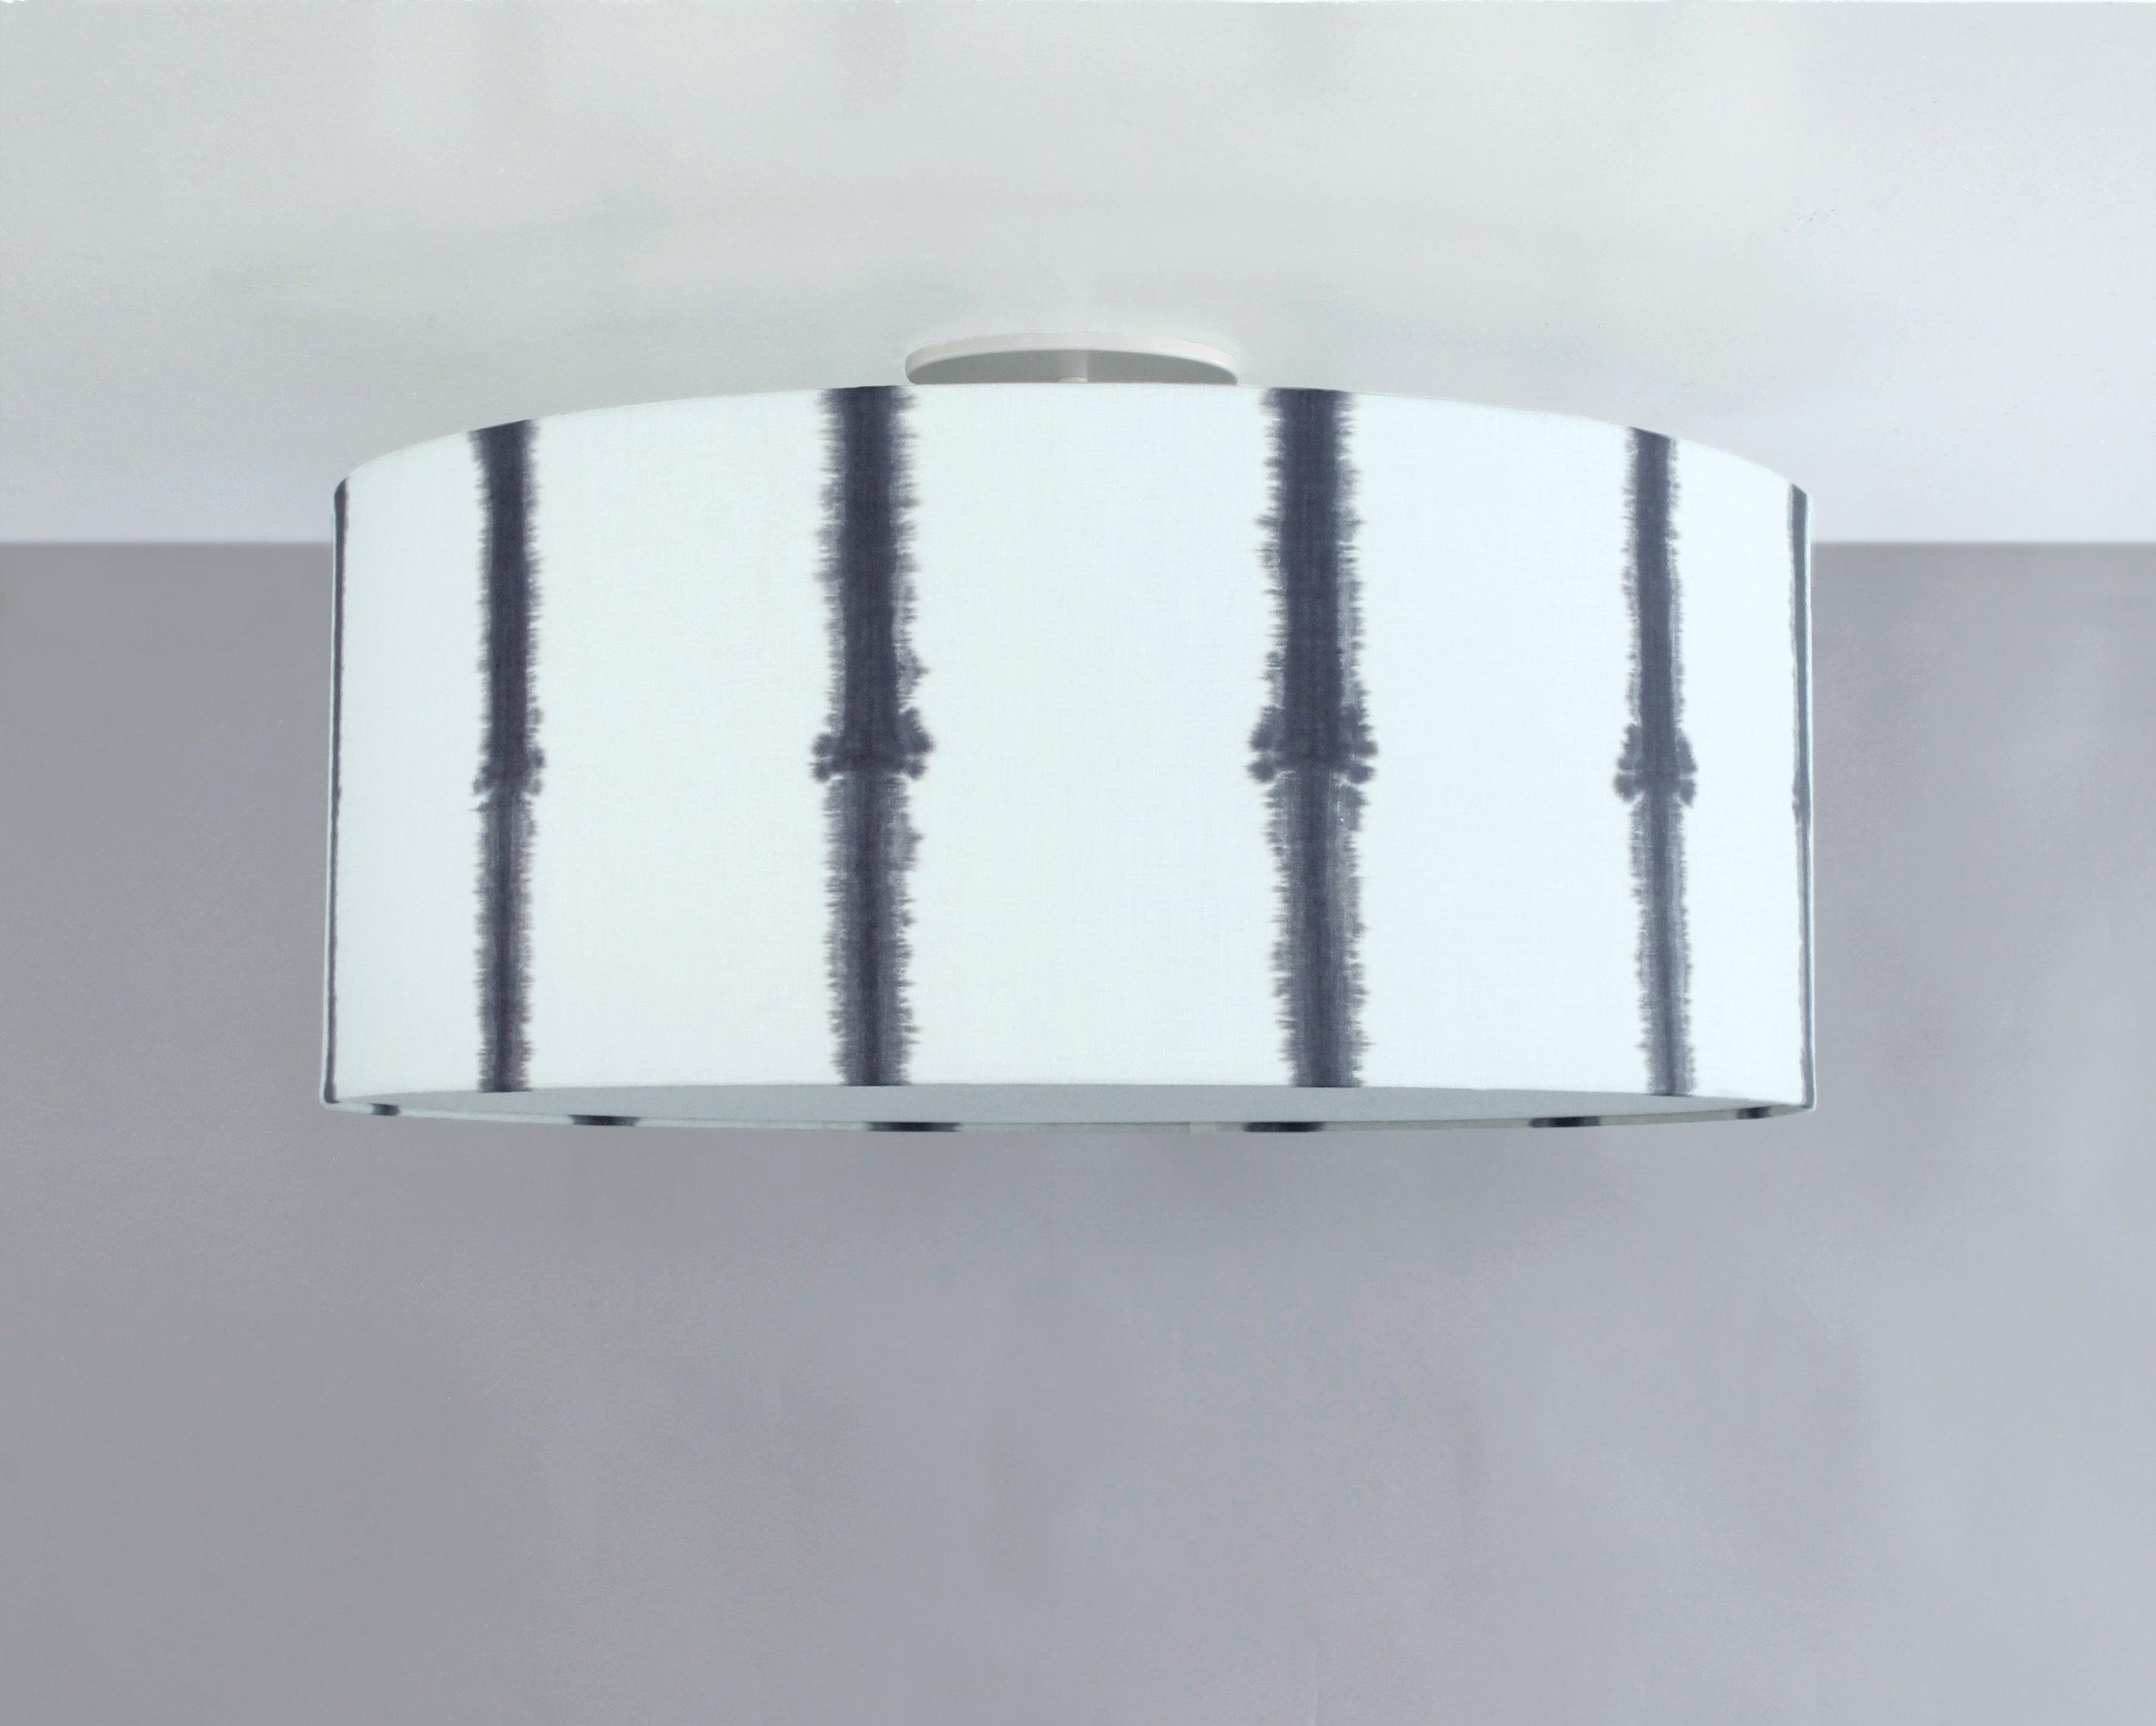 Bone Simple Design_Shibori Vertical Stripe Drum Ceiling Fixture_Black.jpg